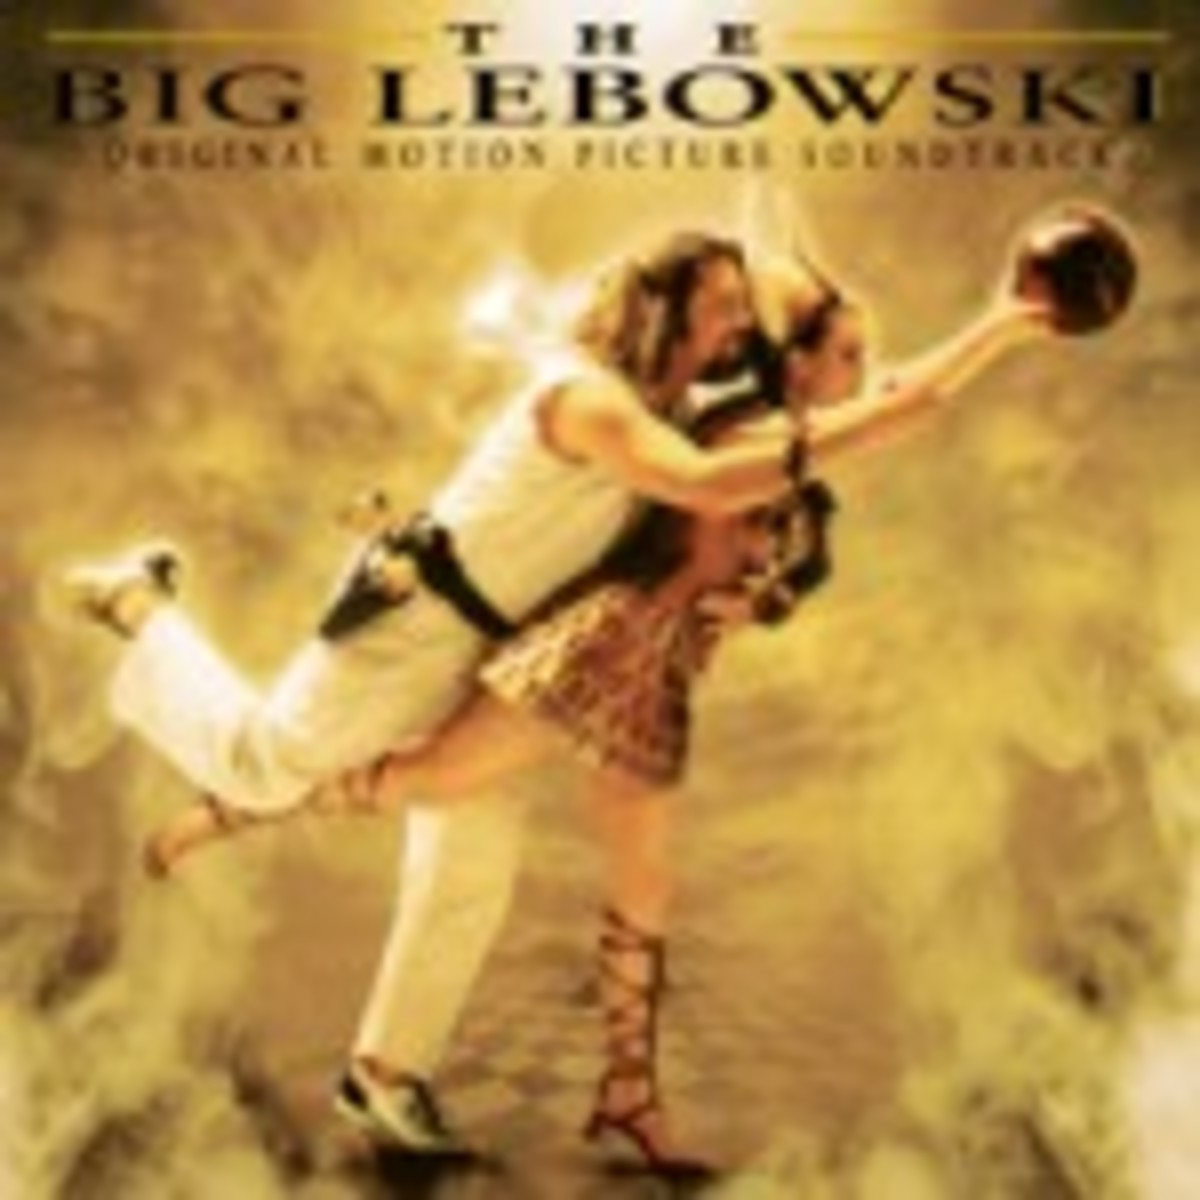 The Big Lebowski soundtrack on vinyl